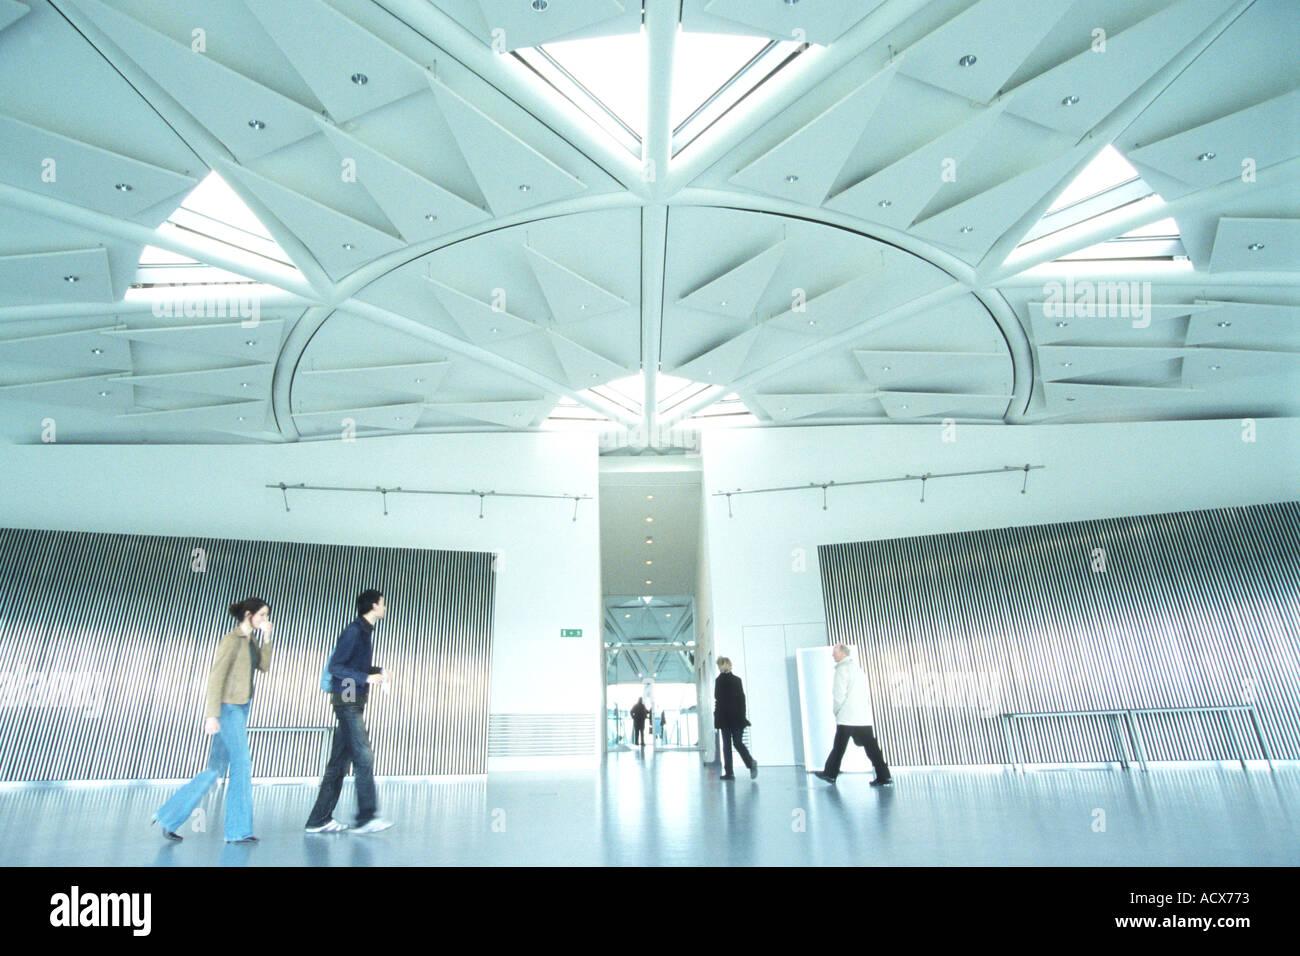 London Assembly Building London UK - Stock Image